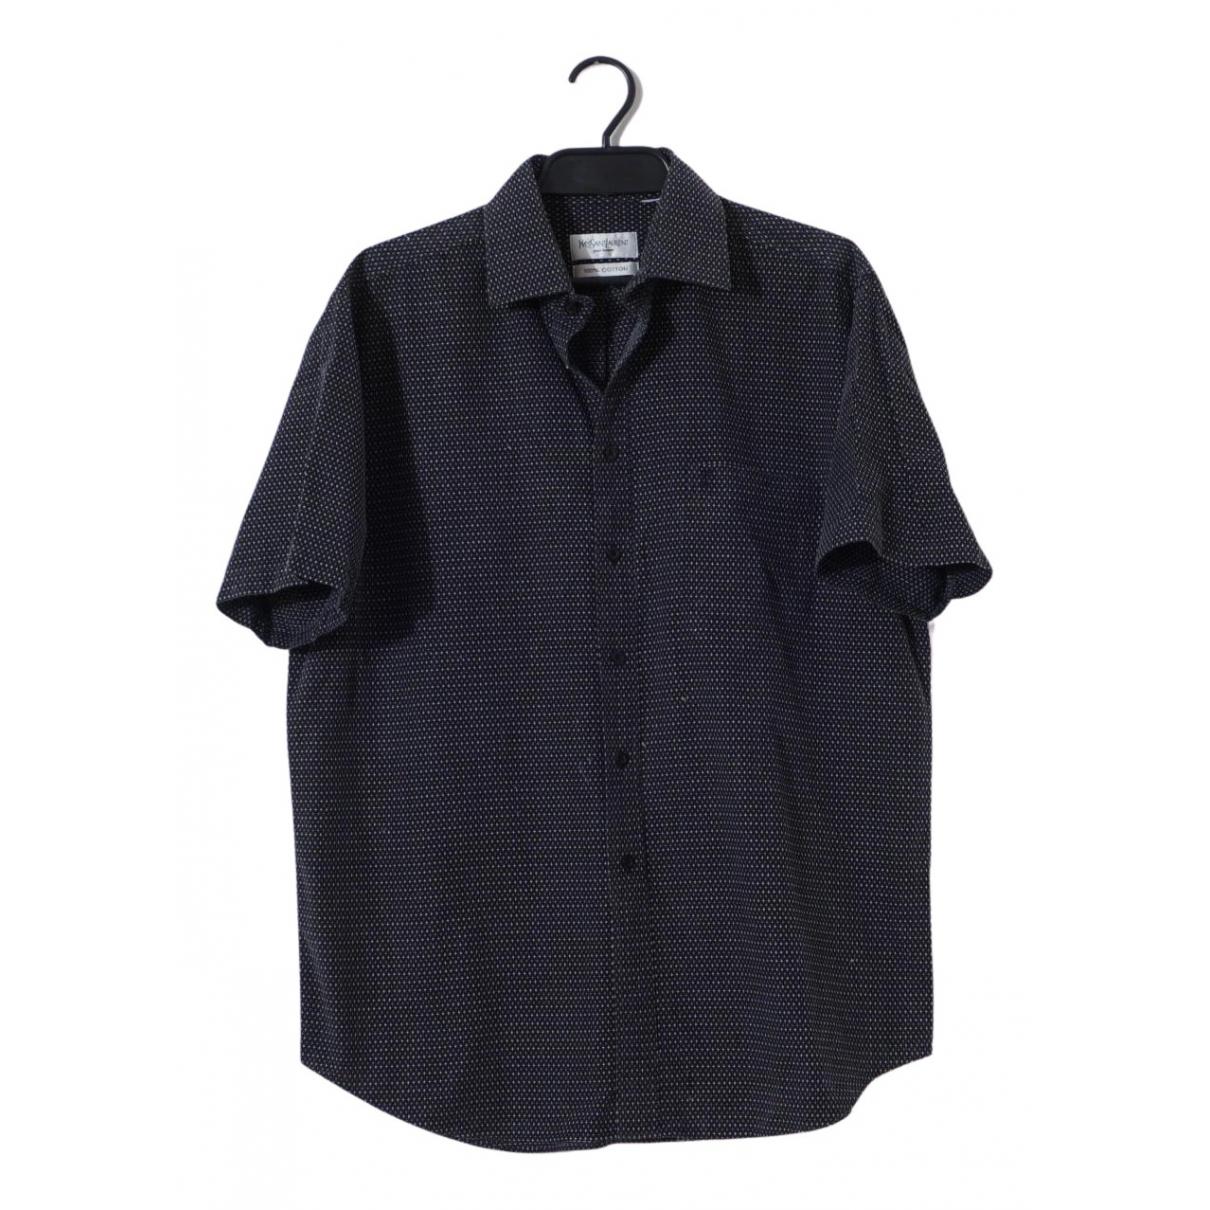 Yves Saint Laurent \N Hemden in  Marine Baumwolle